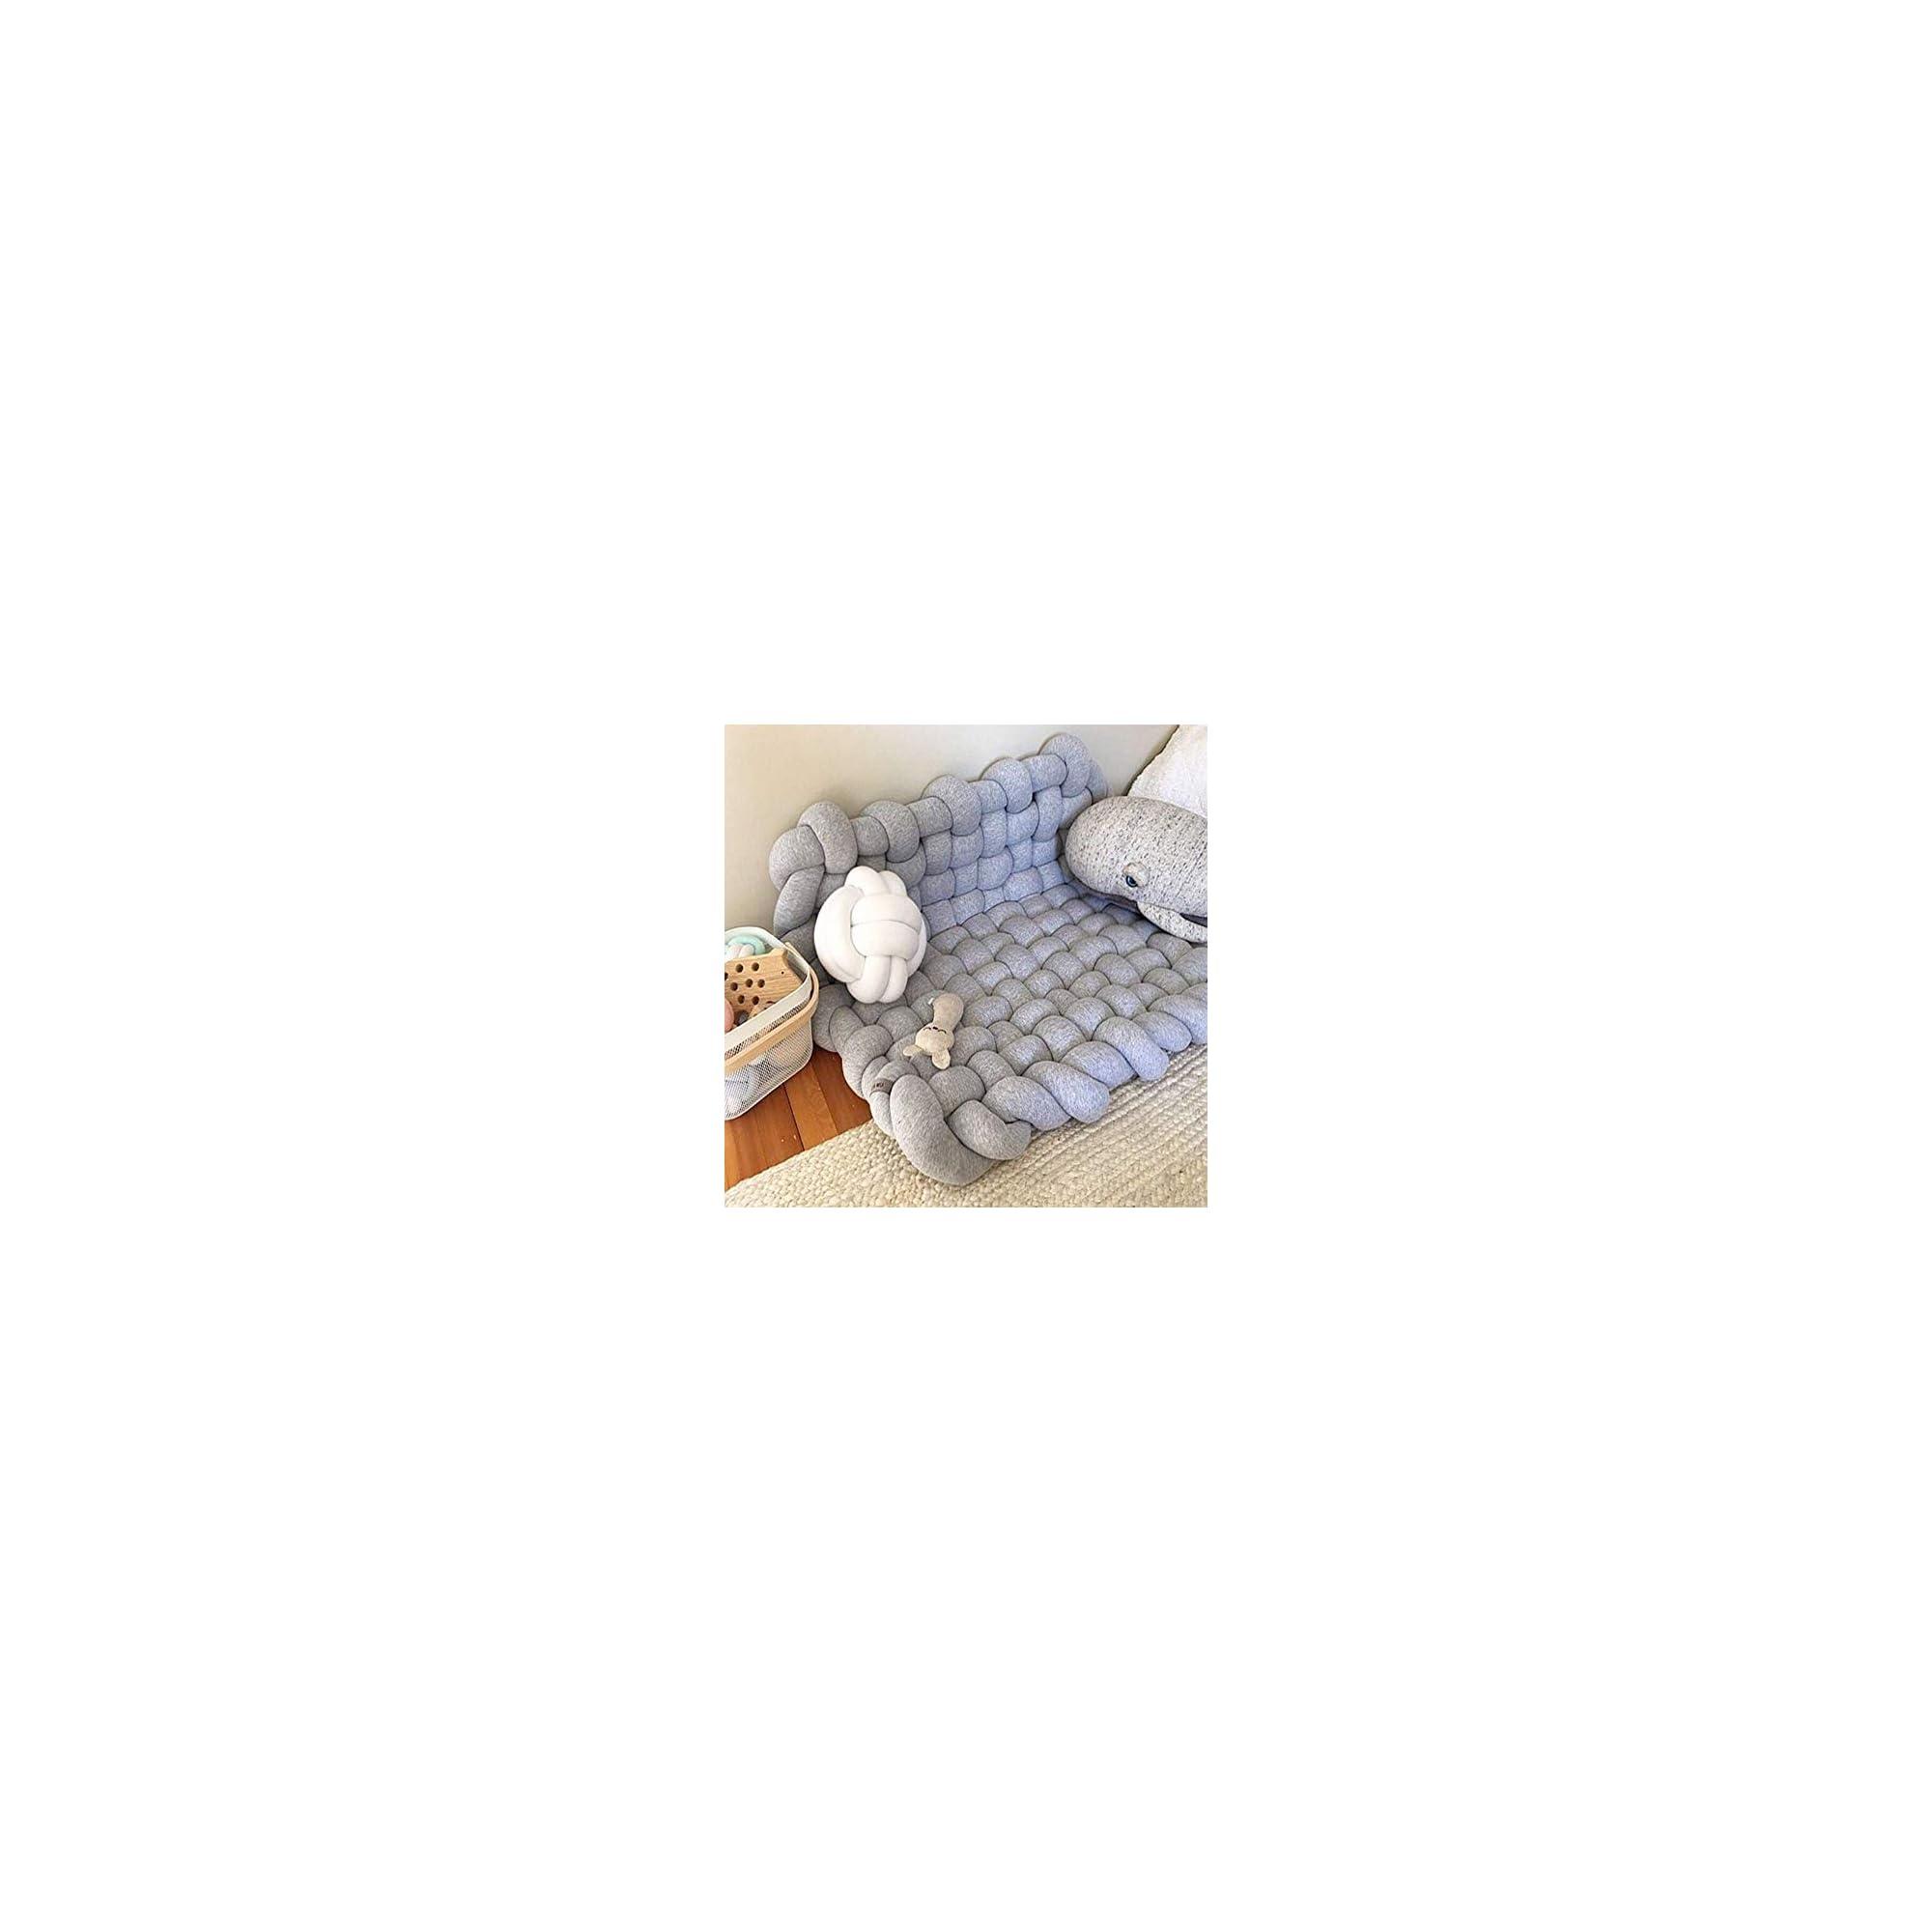 Wonder Space Knotted Braided Plush Mat, Baby Infant Newborn Sleeping Tummy Time Playing Nursery Rug Knot Floor Cushion, Handmade Pure Soft Cotton, Fashion Cute Toddler Children Room Decor, Grey